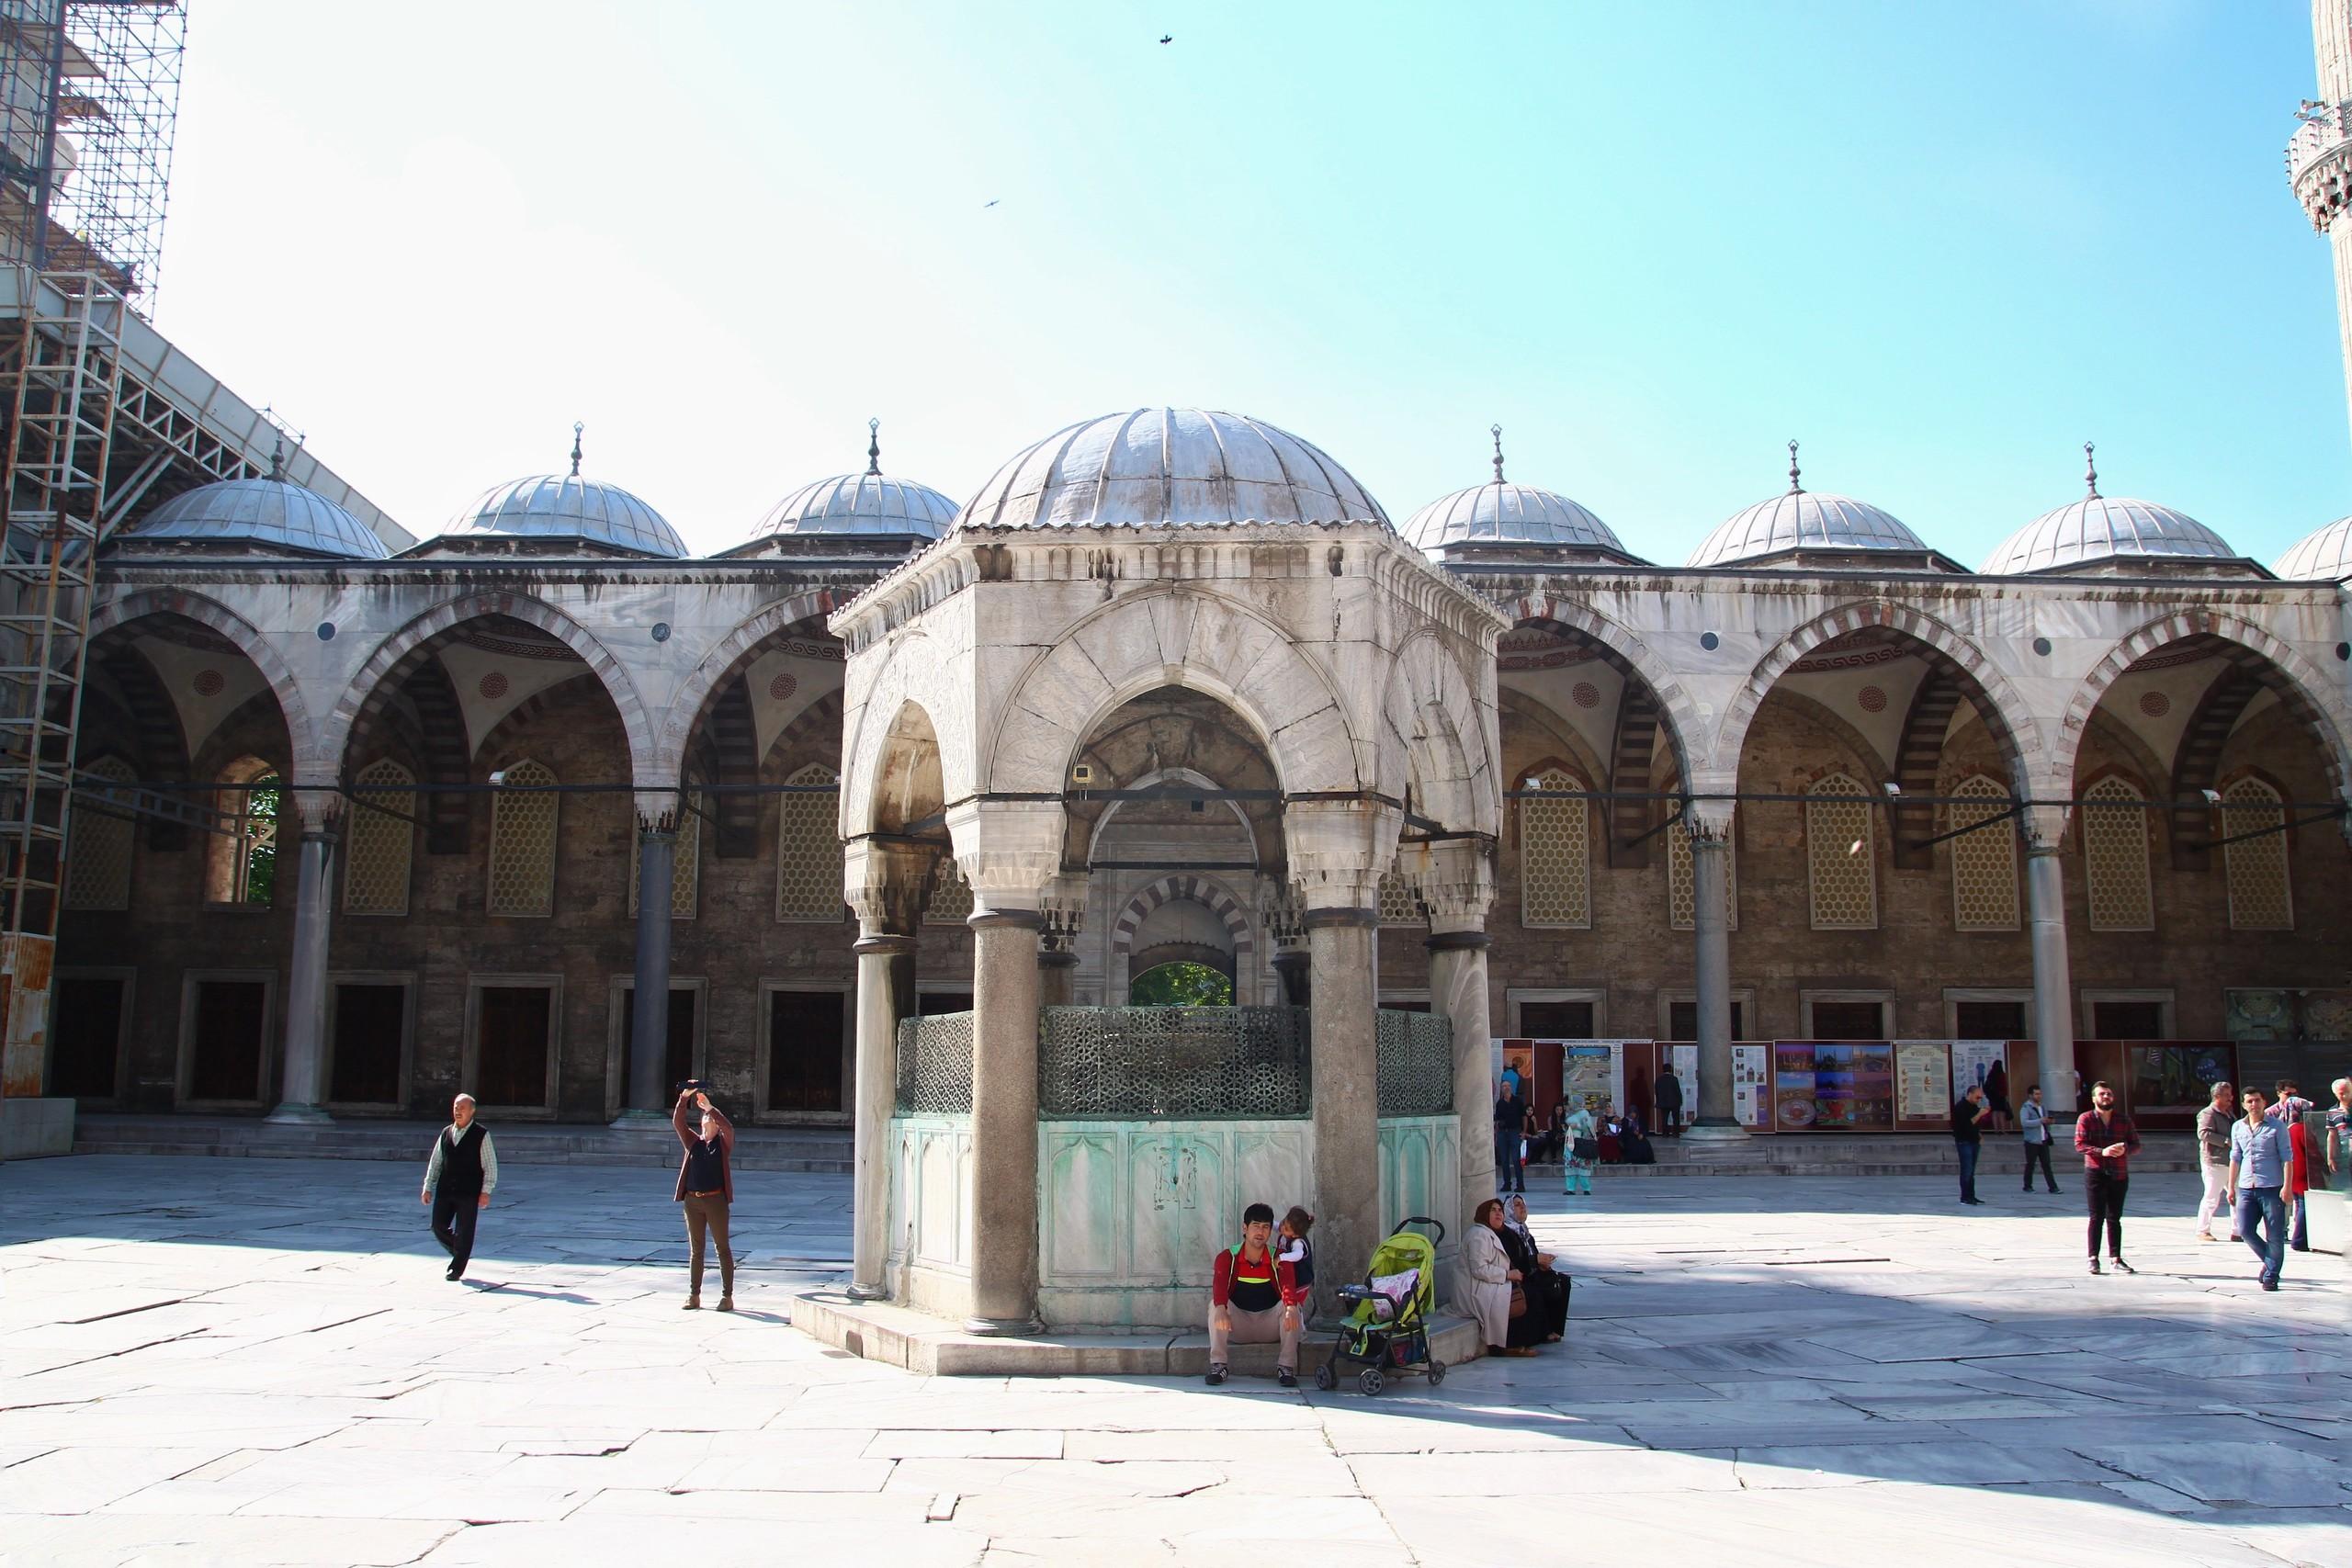 Pırlantadan Kubbeler #5: Sultanahmed - pPM3YL - Pırlantadan Kubbeler #5: Sultanahmed